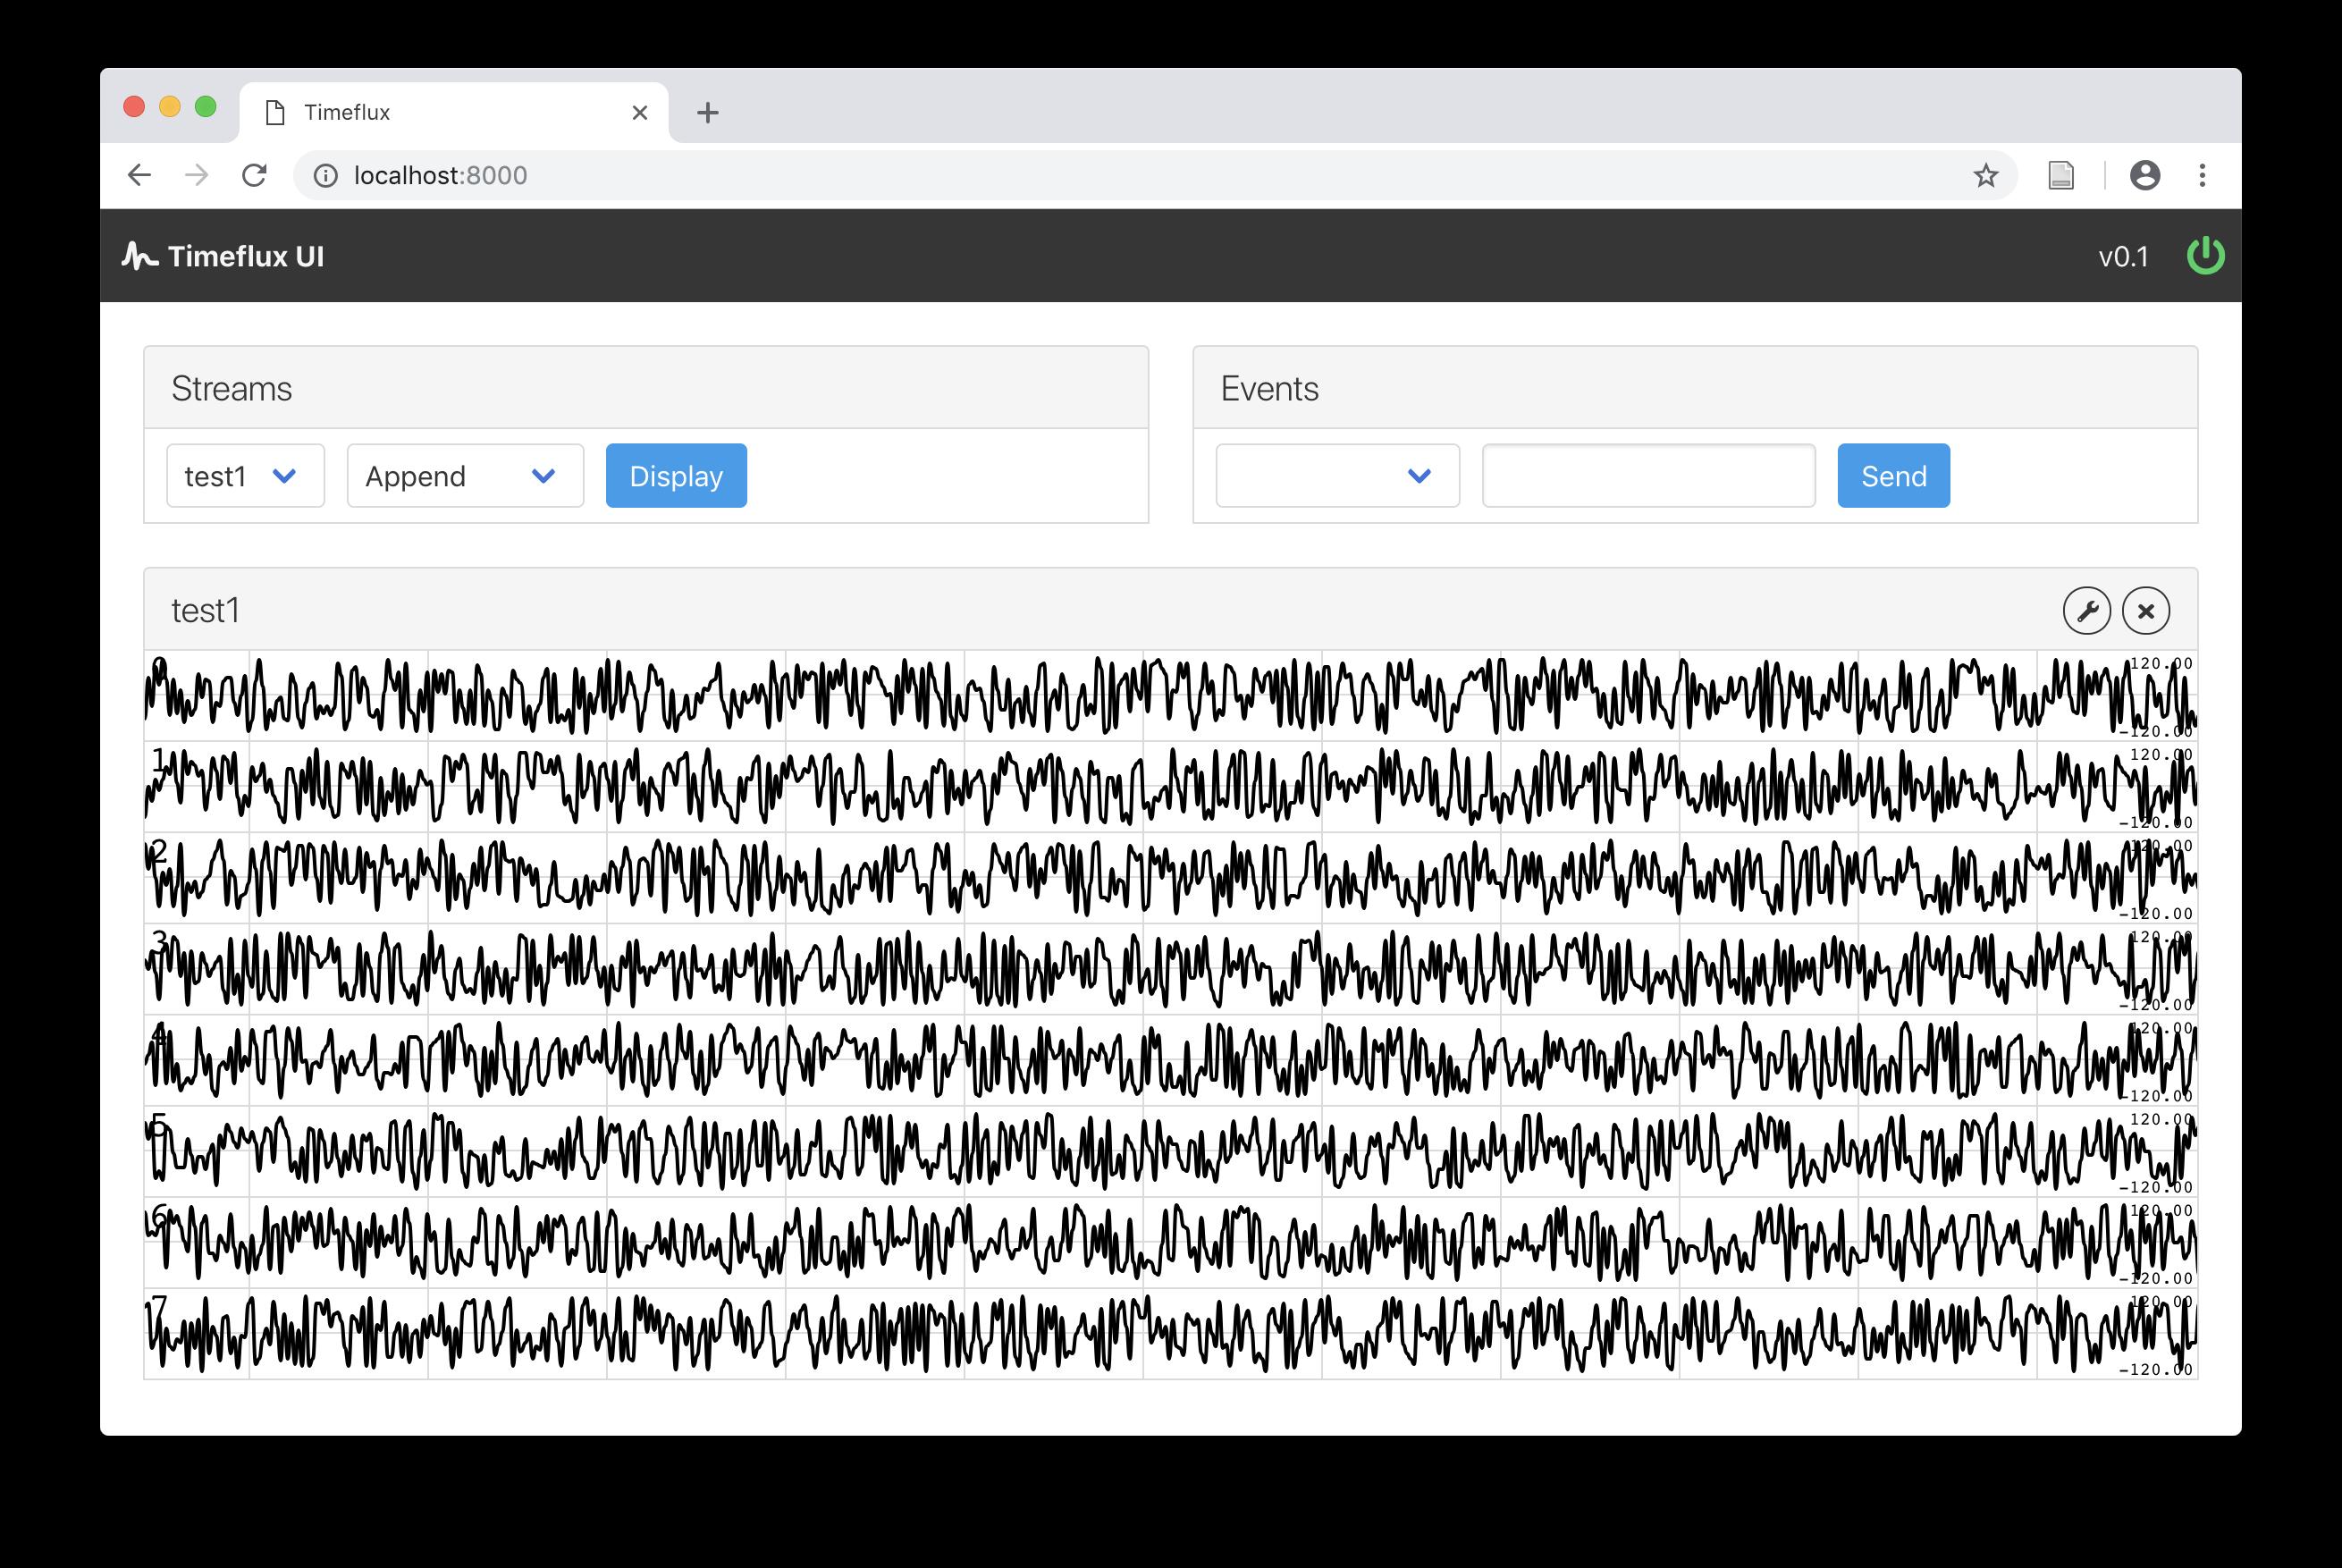 https://github.com/timeflux/timeflux_ui/raw/master/doc/static/img/screenshot.png